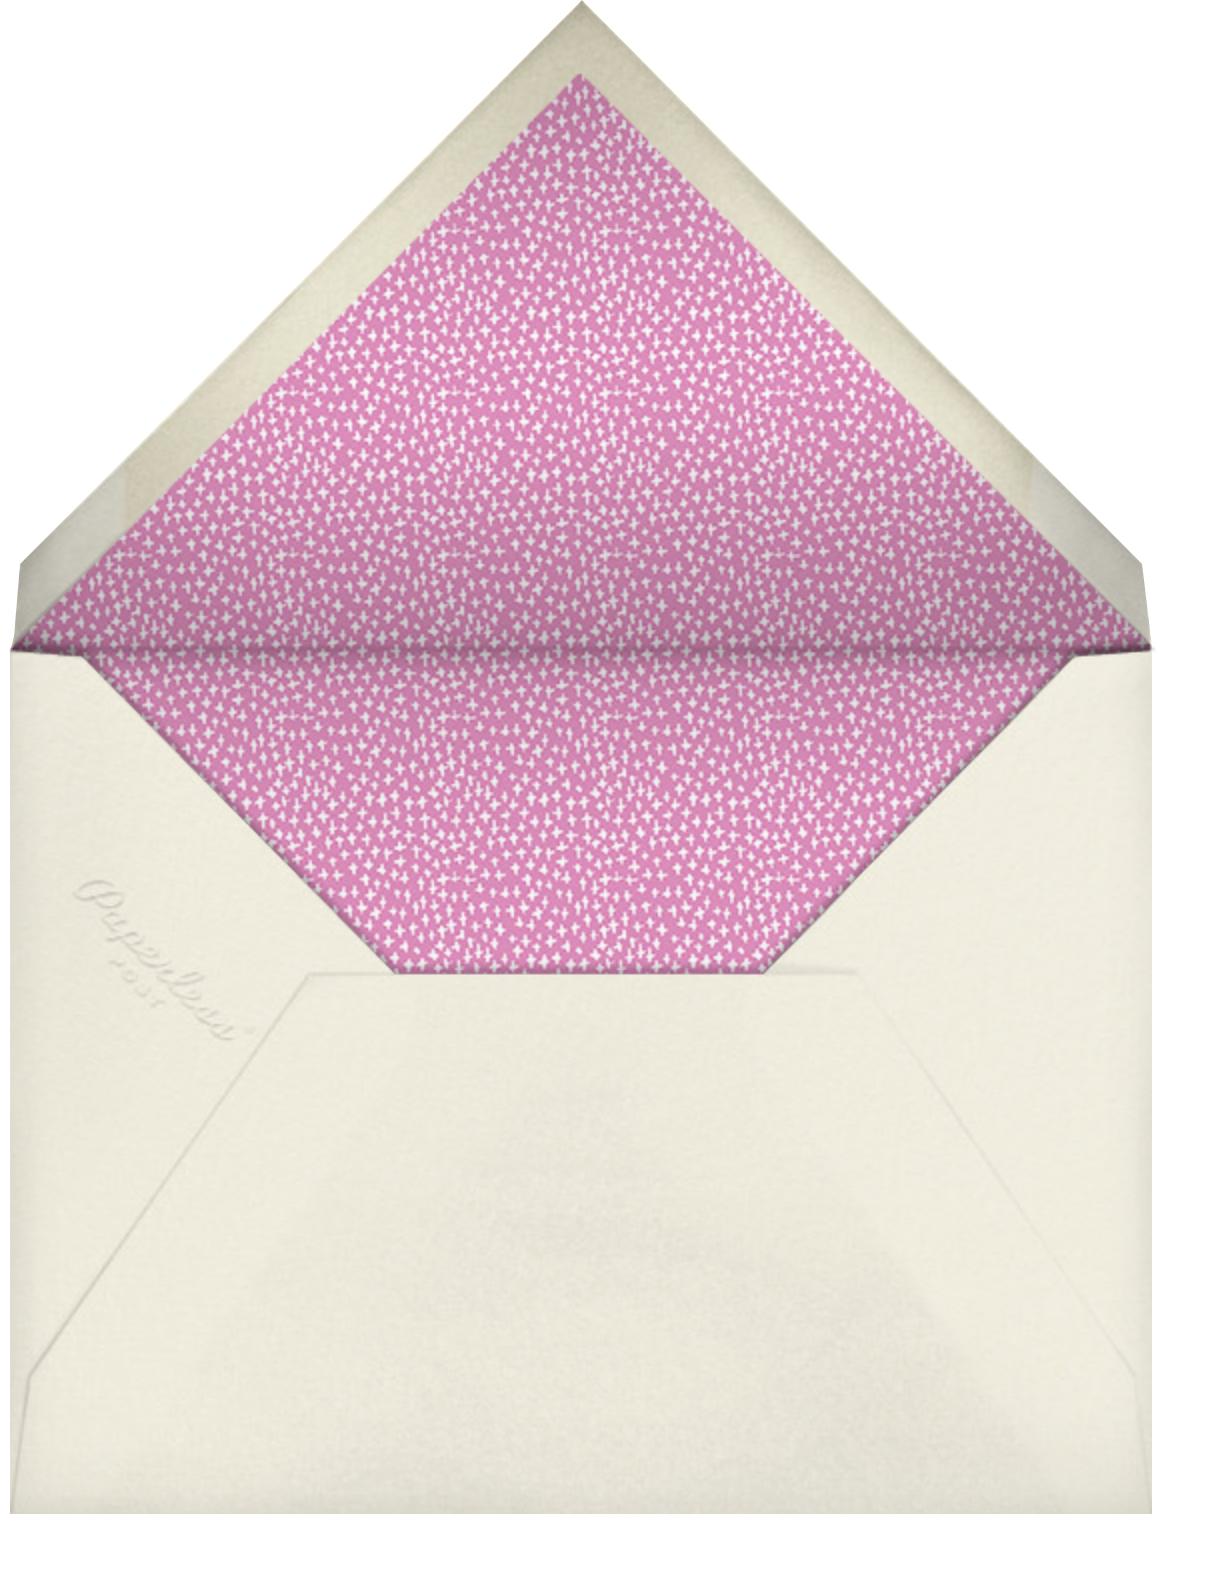 Throwback - Mr. Boddington's Studio - Thinking of you - envelope back